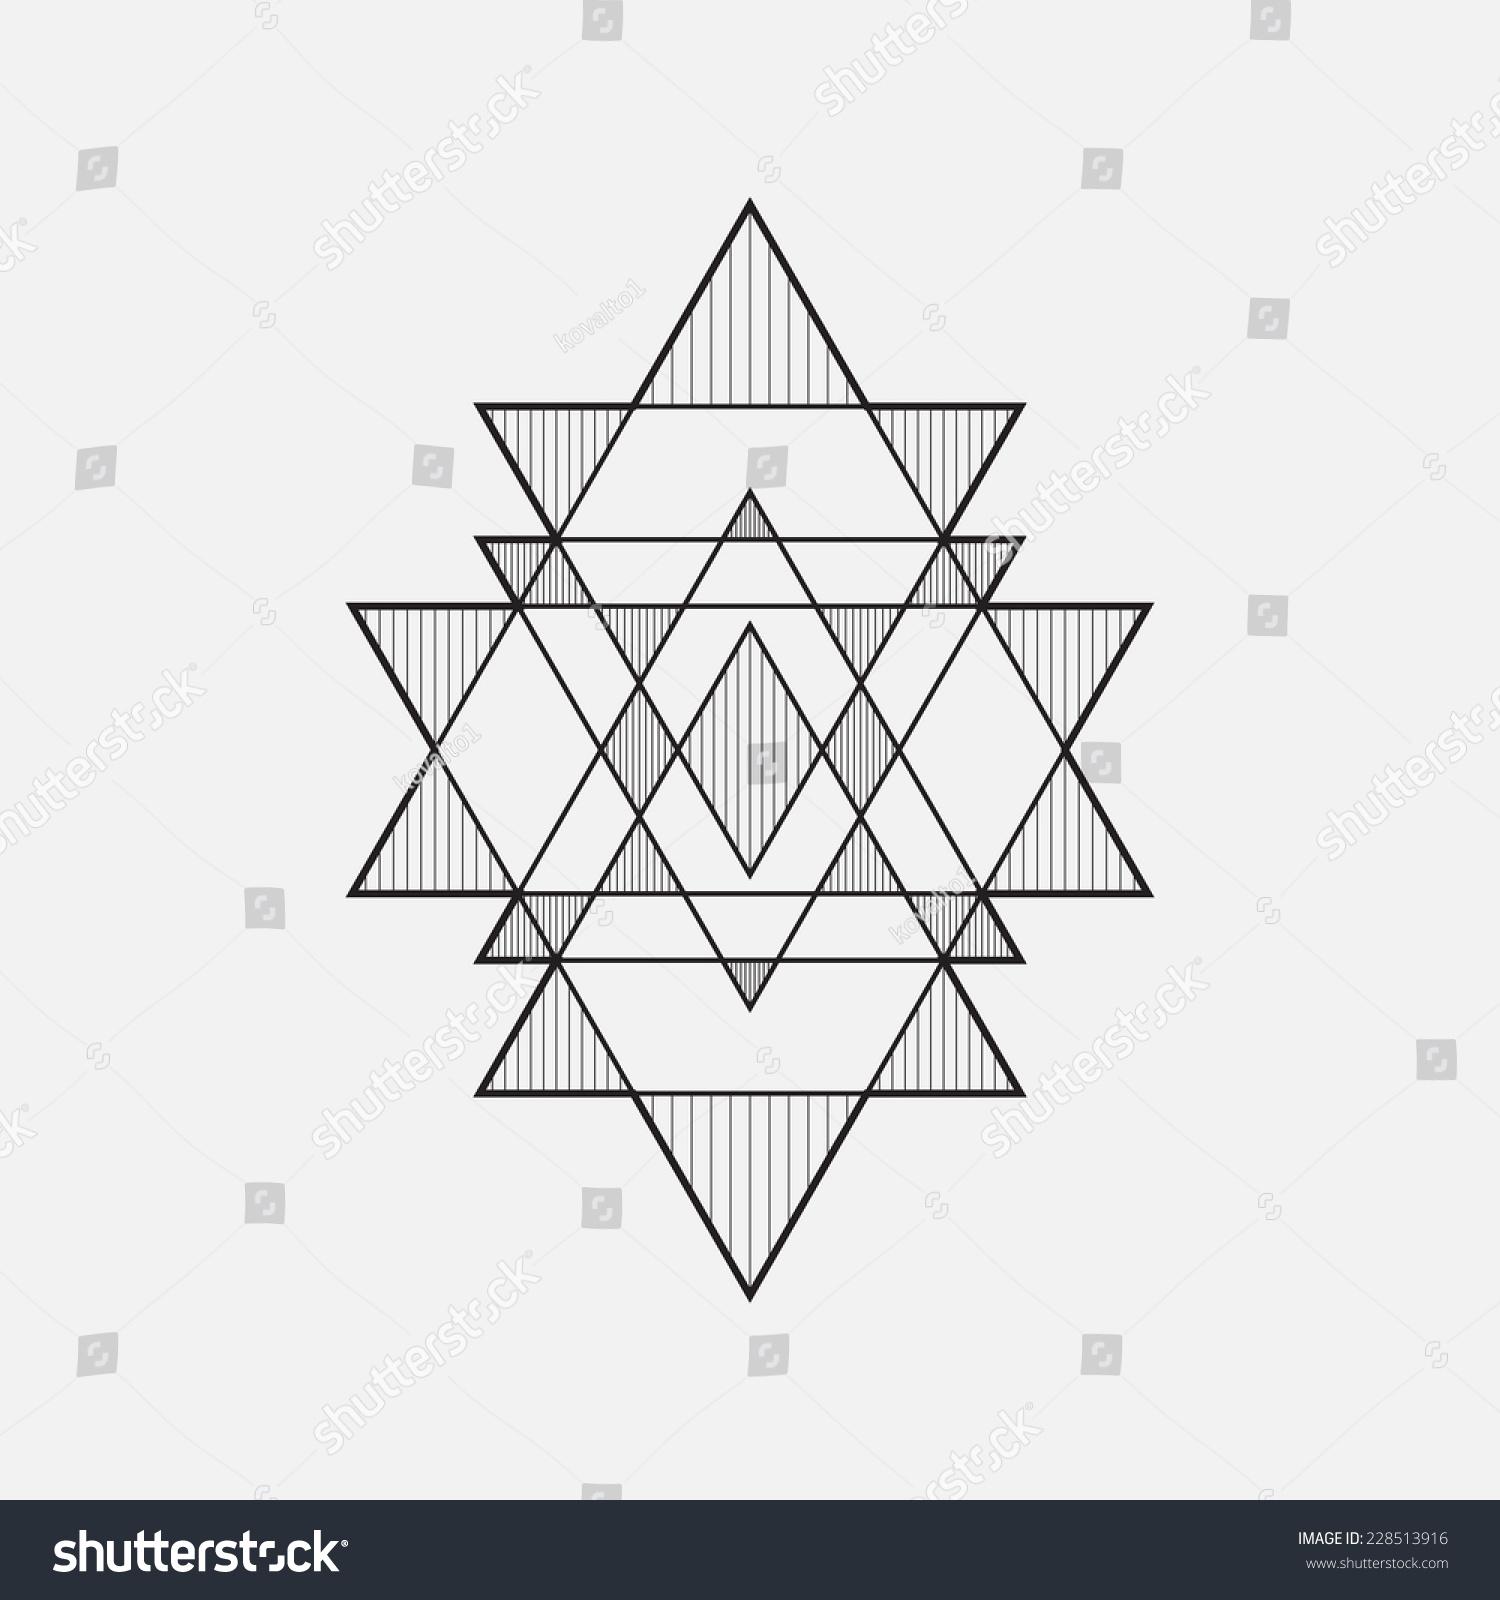 Geometric Shapes Line Design Triangle Stock Vector